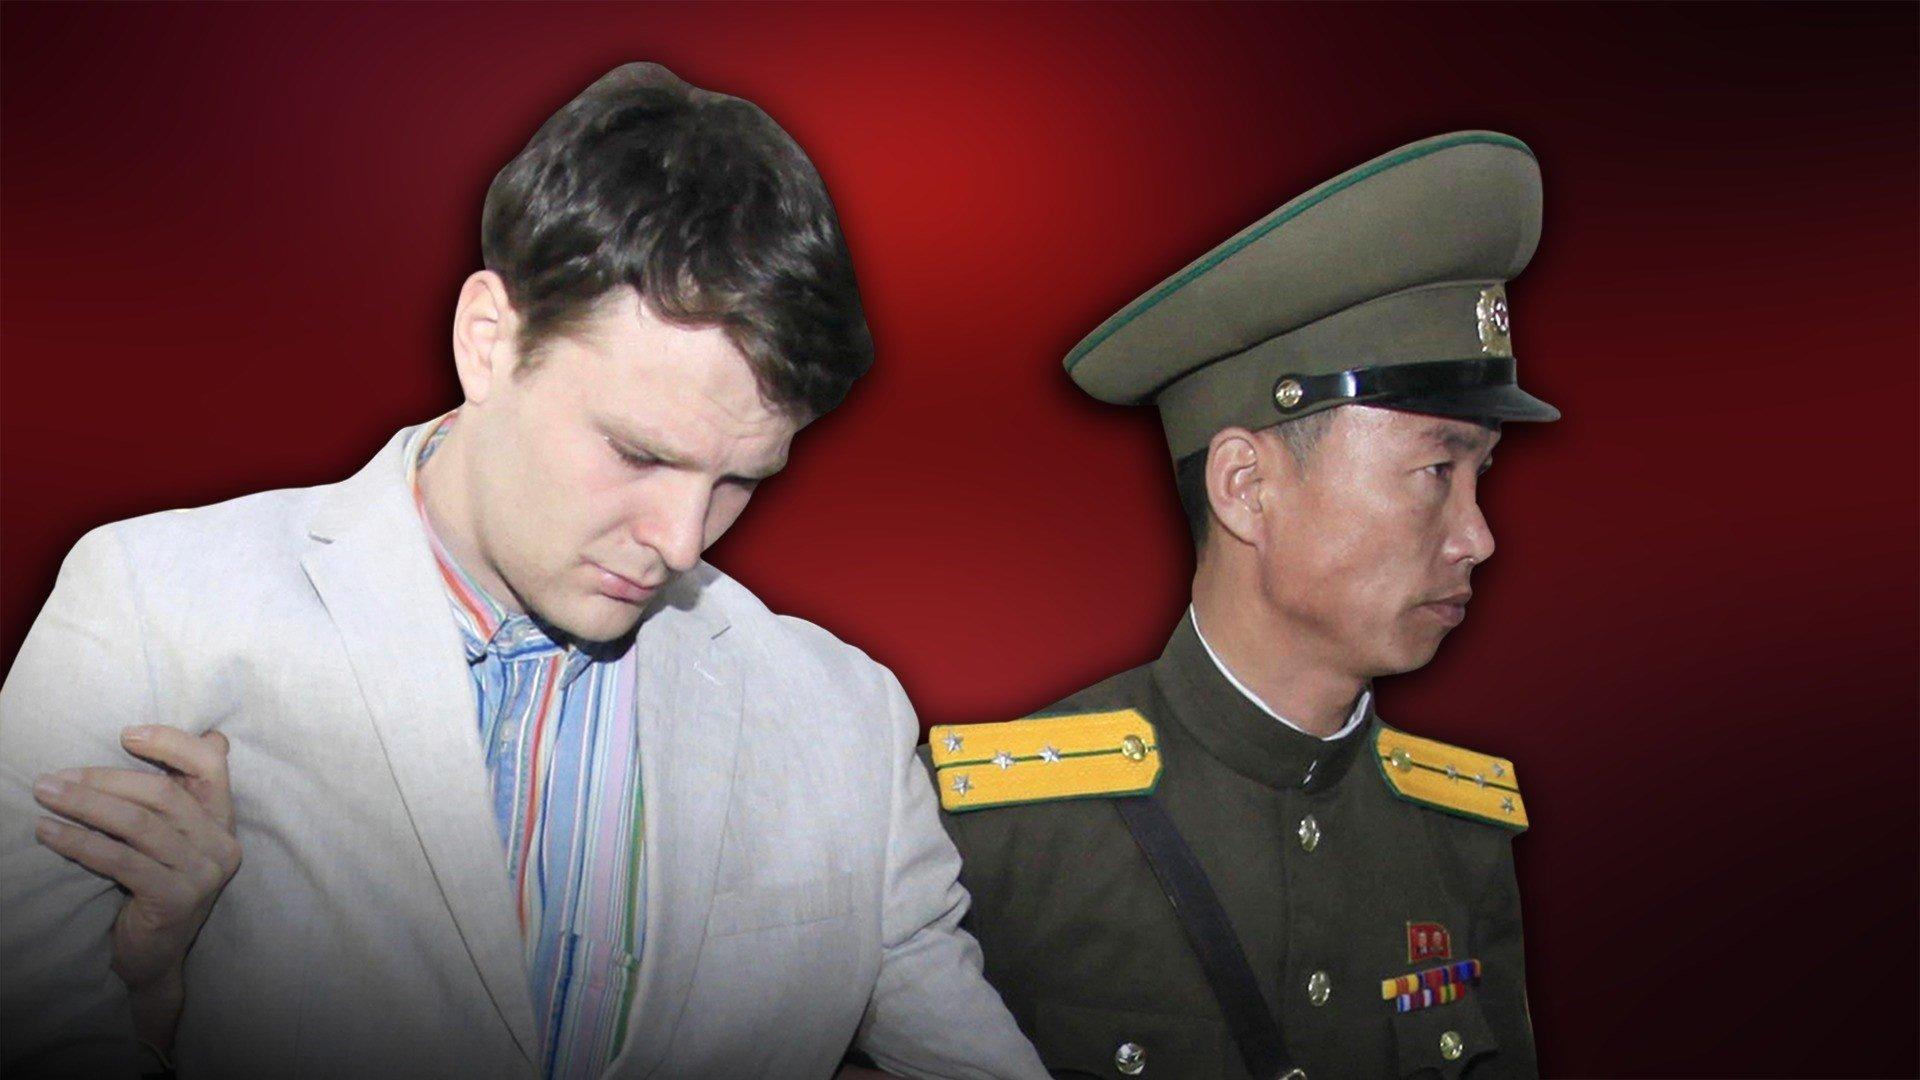 University of Virginia student Otto Warmbier under detention in North Korea.